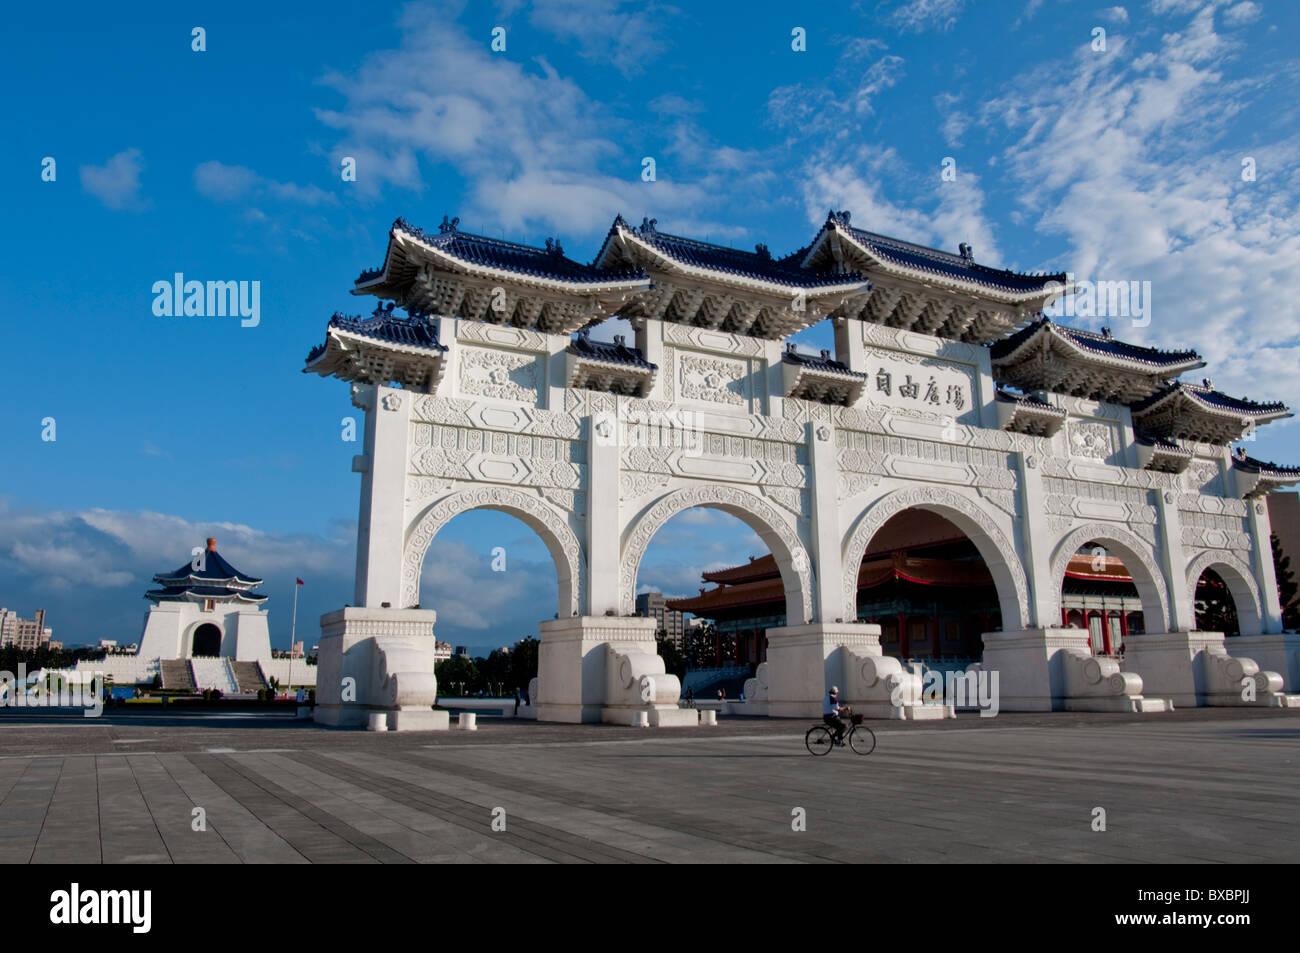 Asia, Taiwán, Taipei, Chiang Kai Shek Memorial Hall arch daylight Imagen De Stock